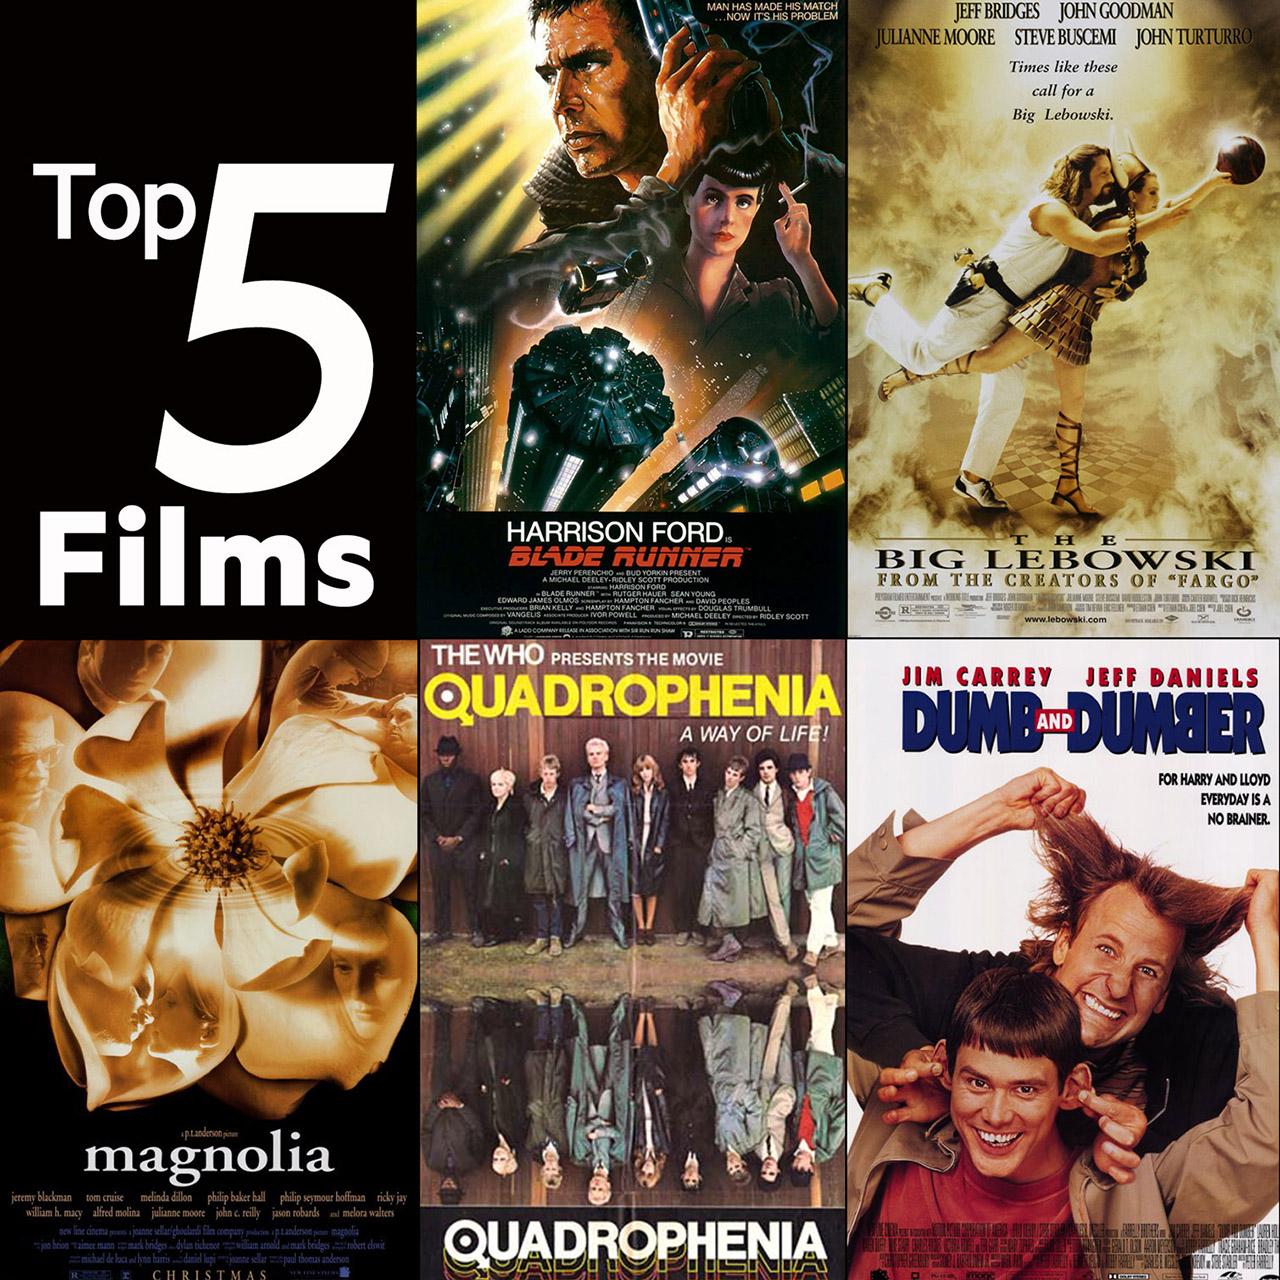 Top5films 3